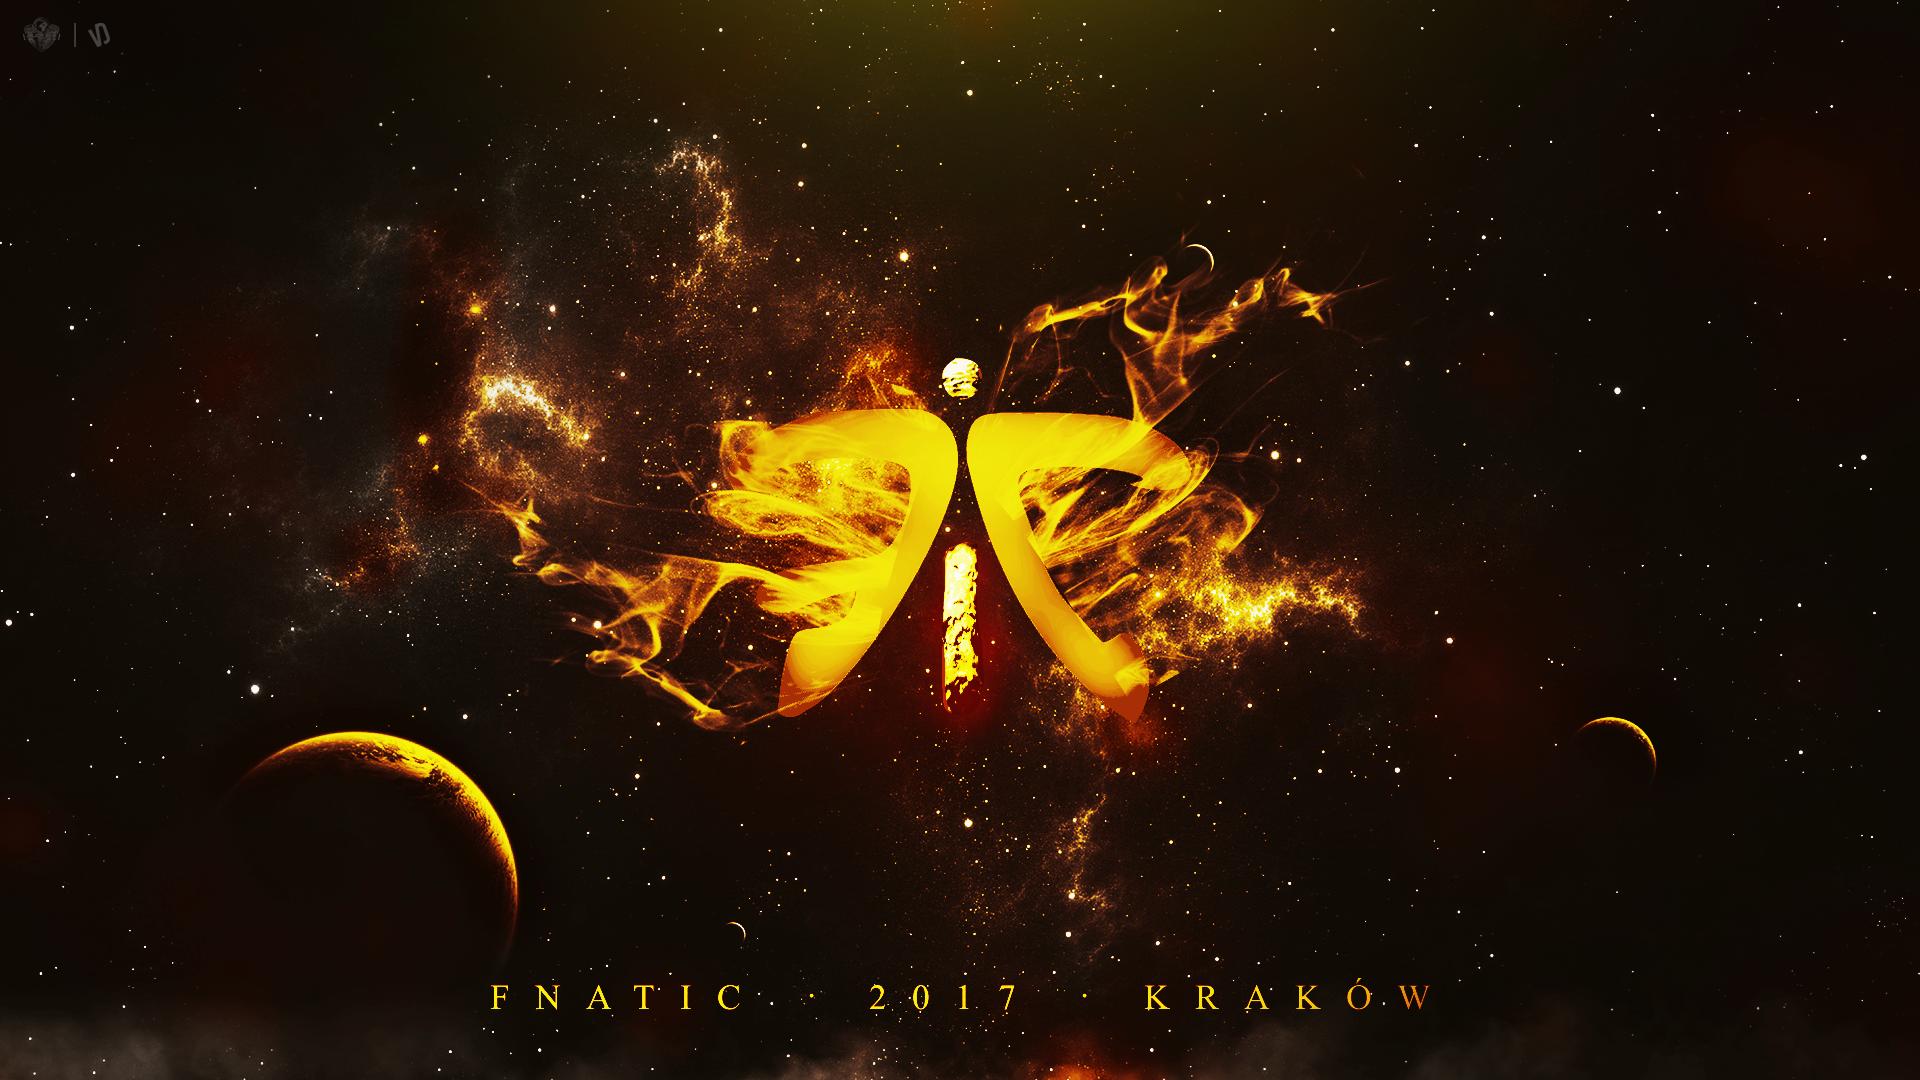 Fnatic | Major 2017 Kraków